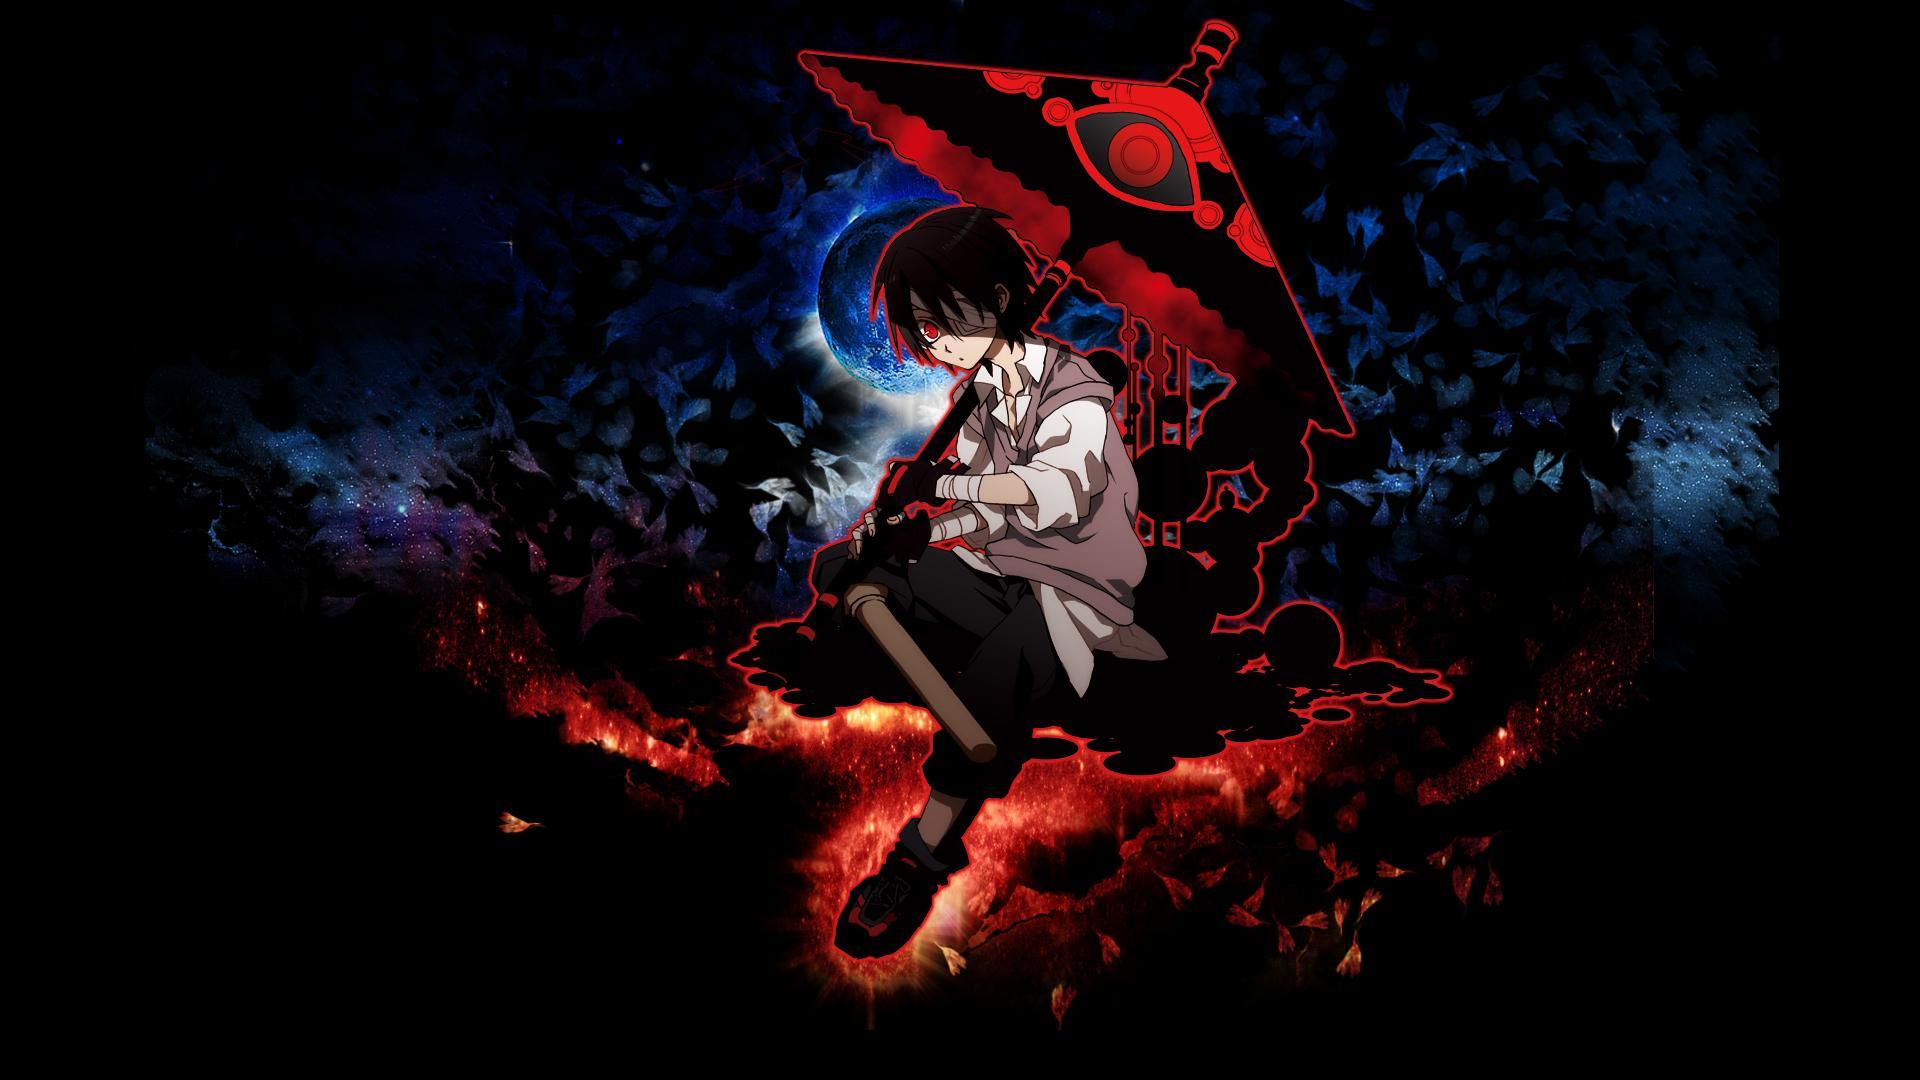 Cool-Anime-HD-1920x1080-wallpaper-wp3604251